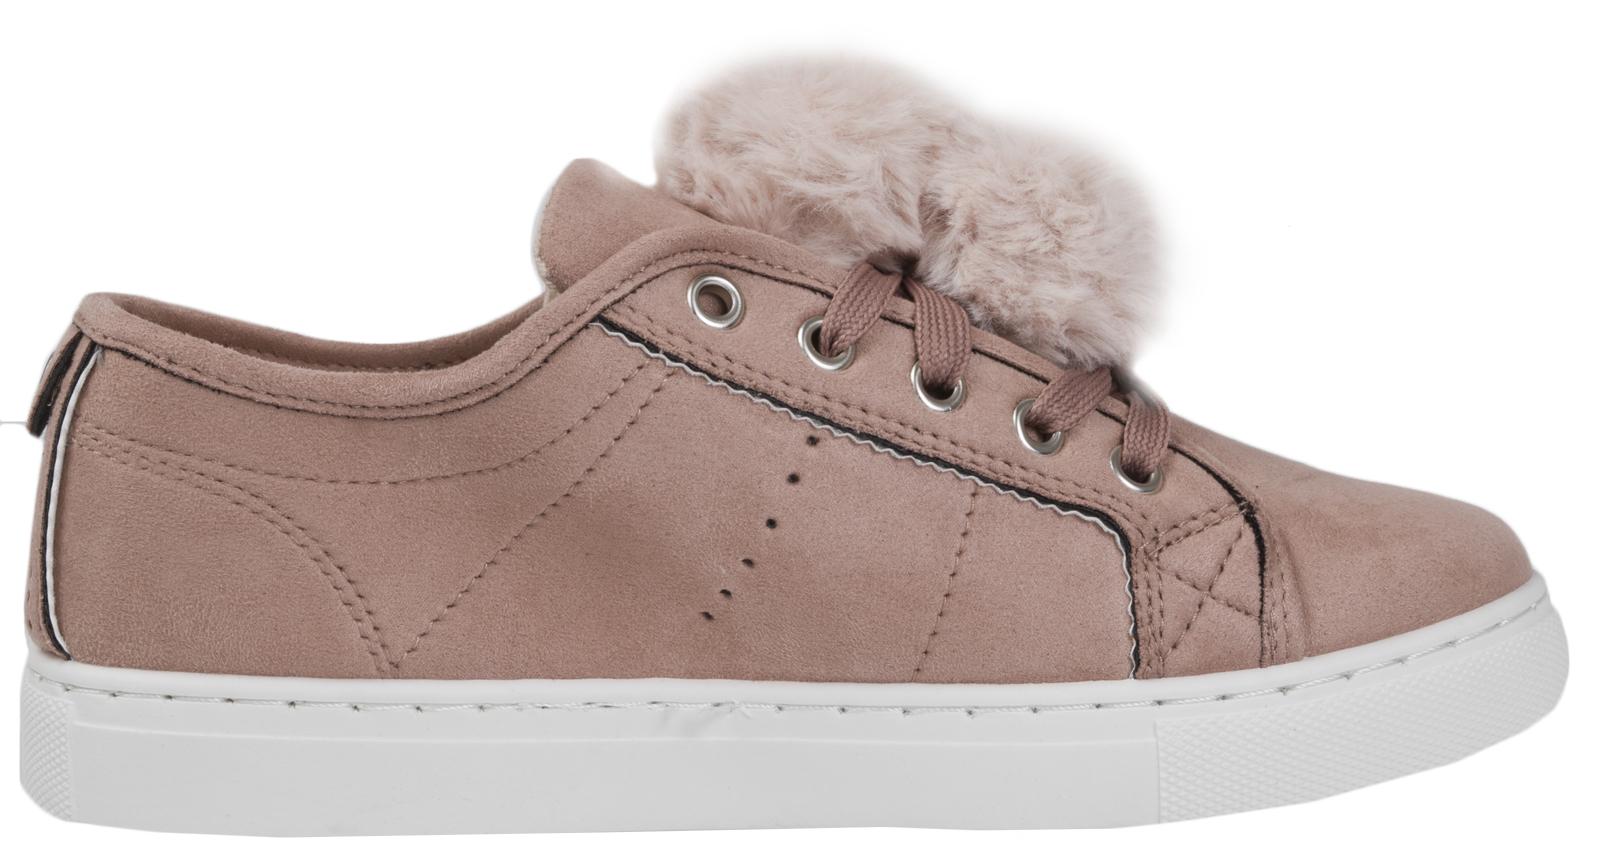 New Womens Ladies Rabbit Pom Pom Casual Shoes